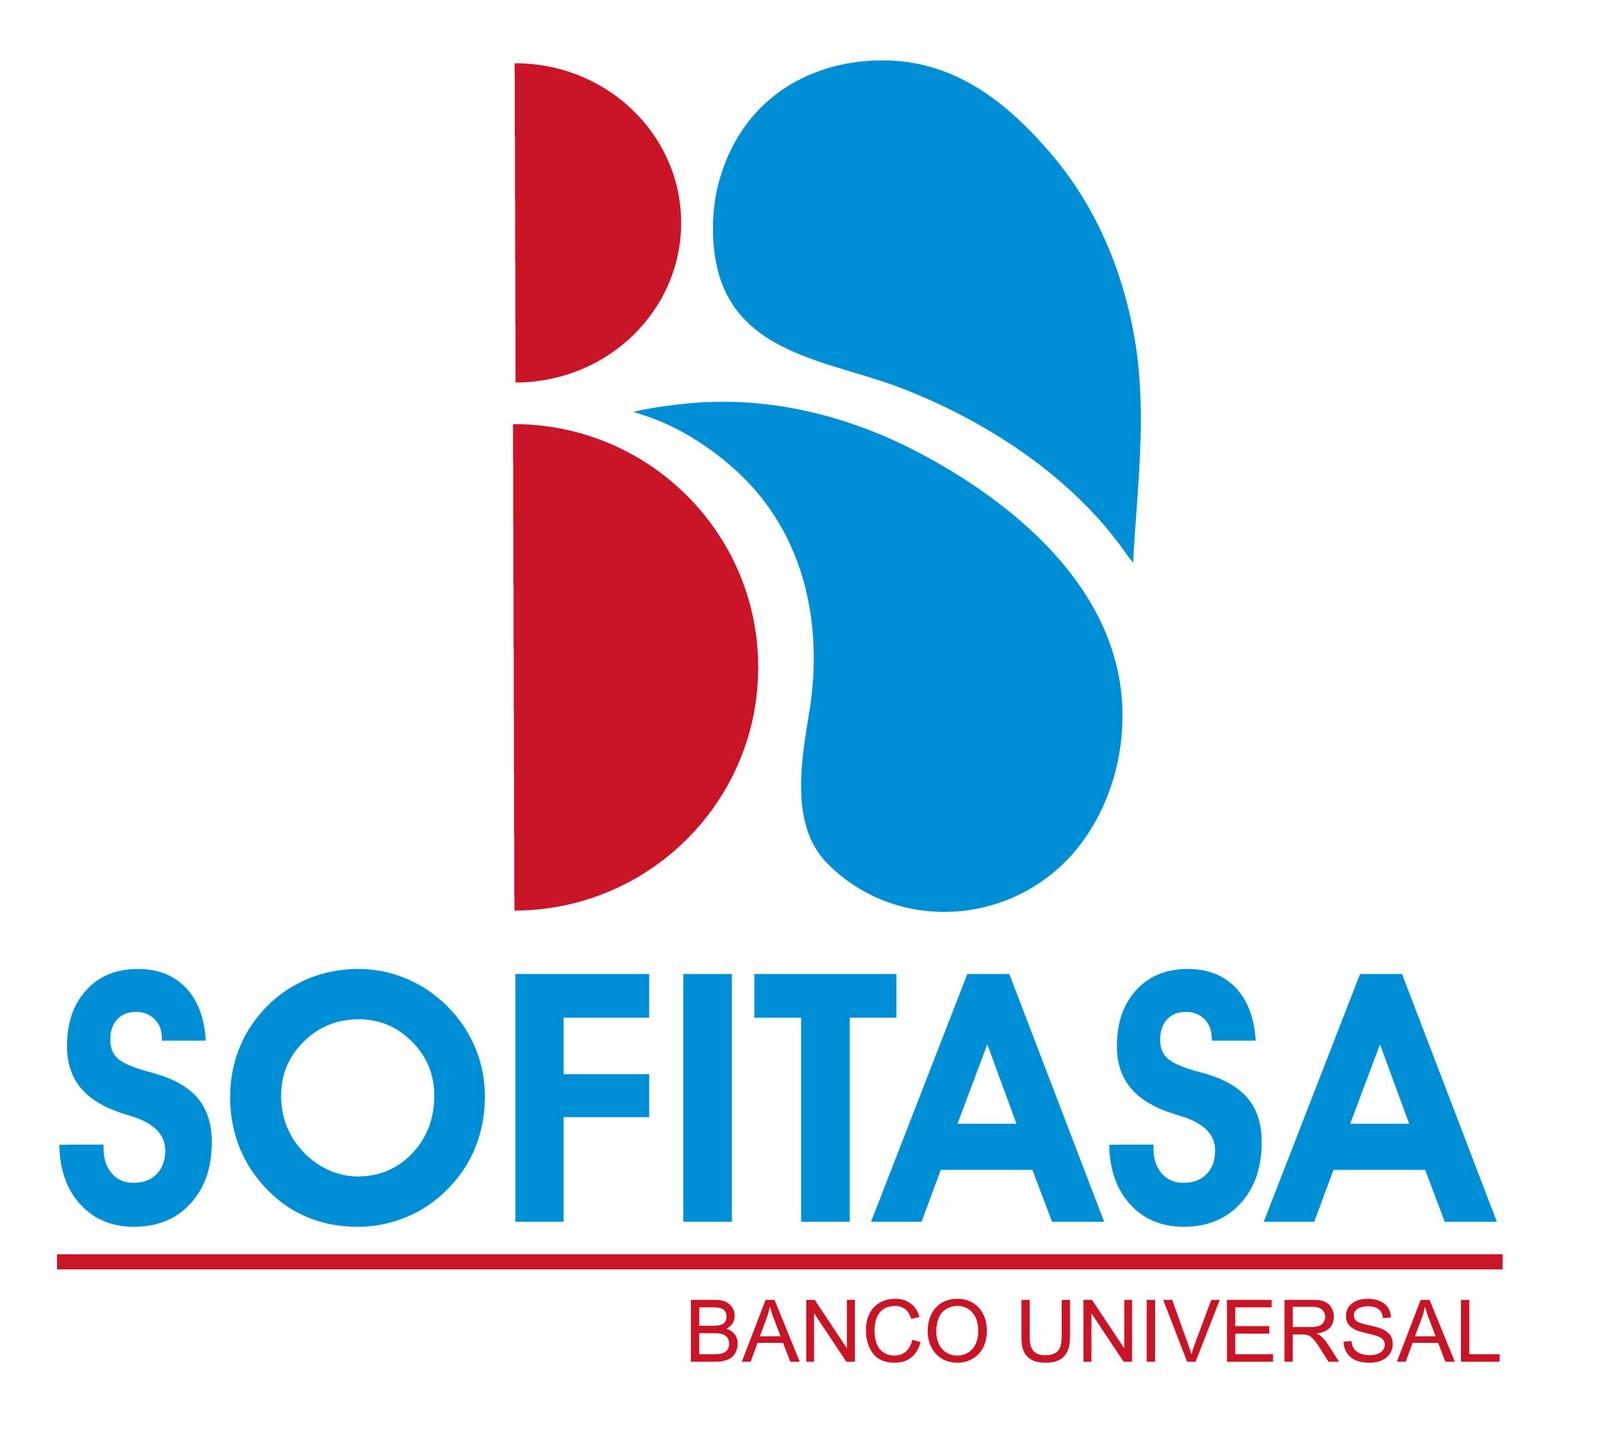 Banco Sofitasa Logo photo - 1